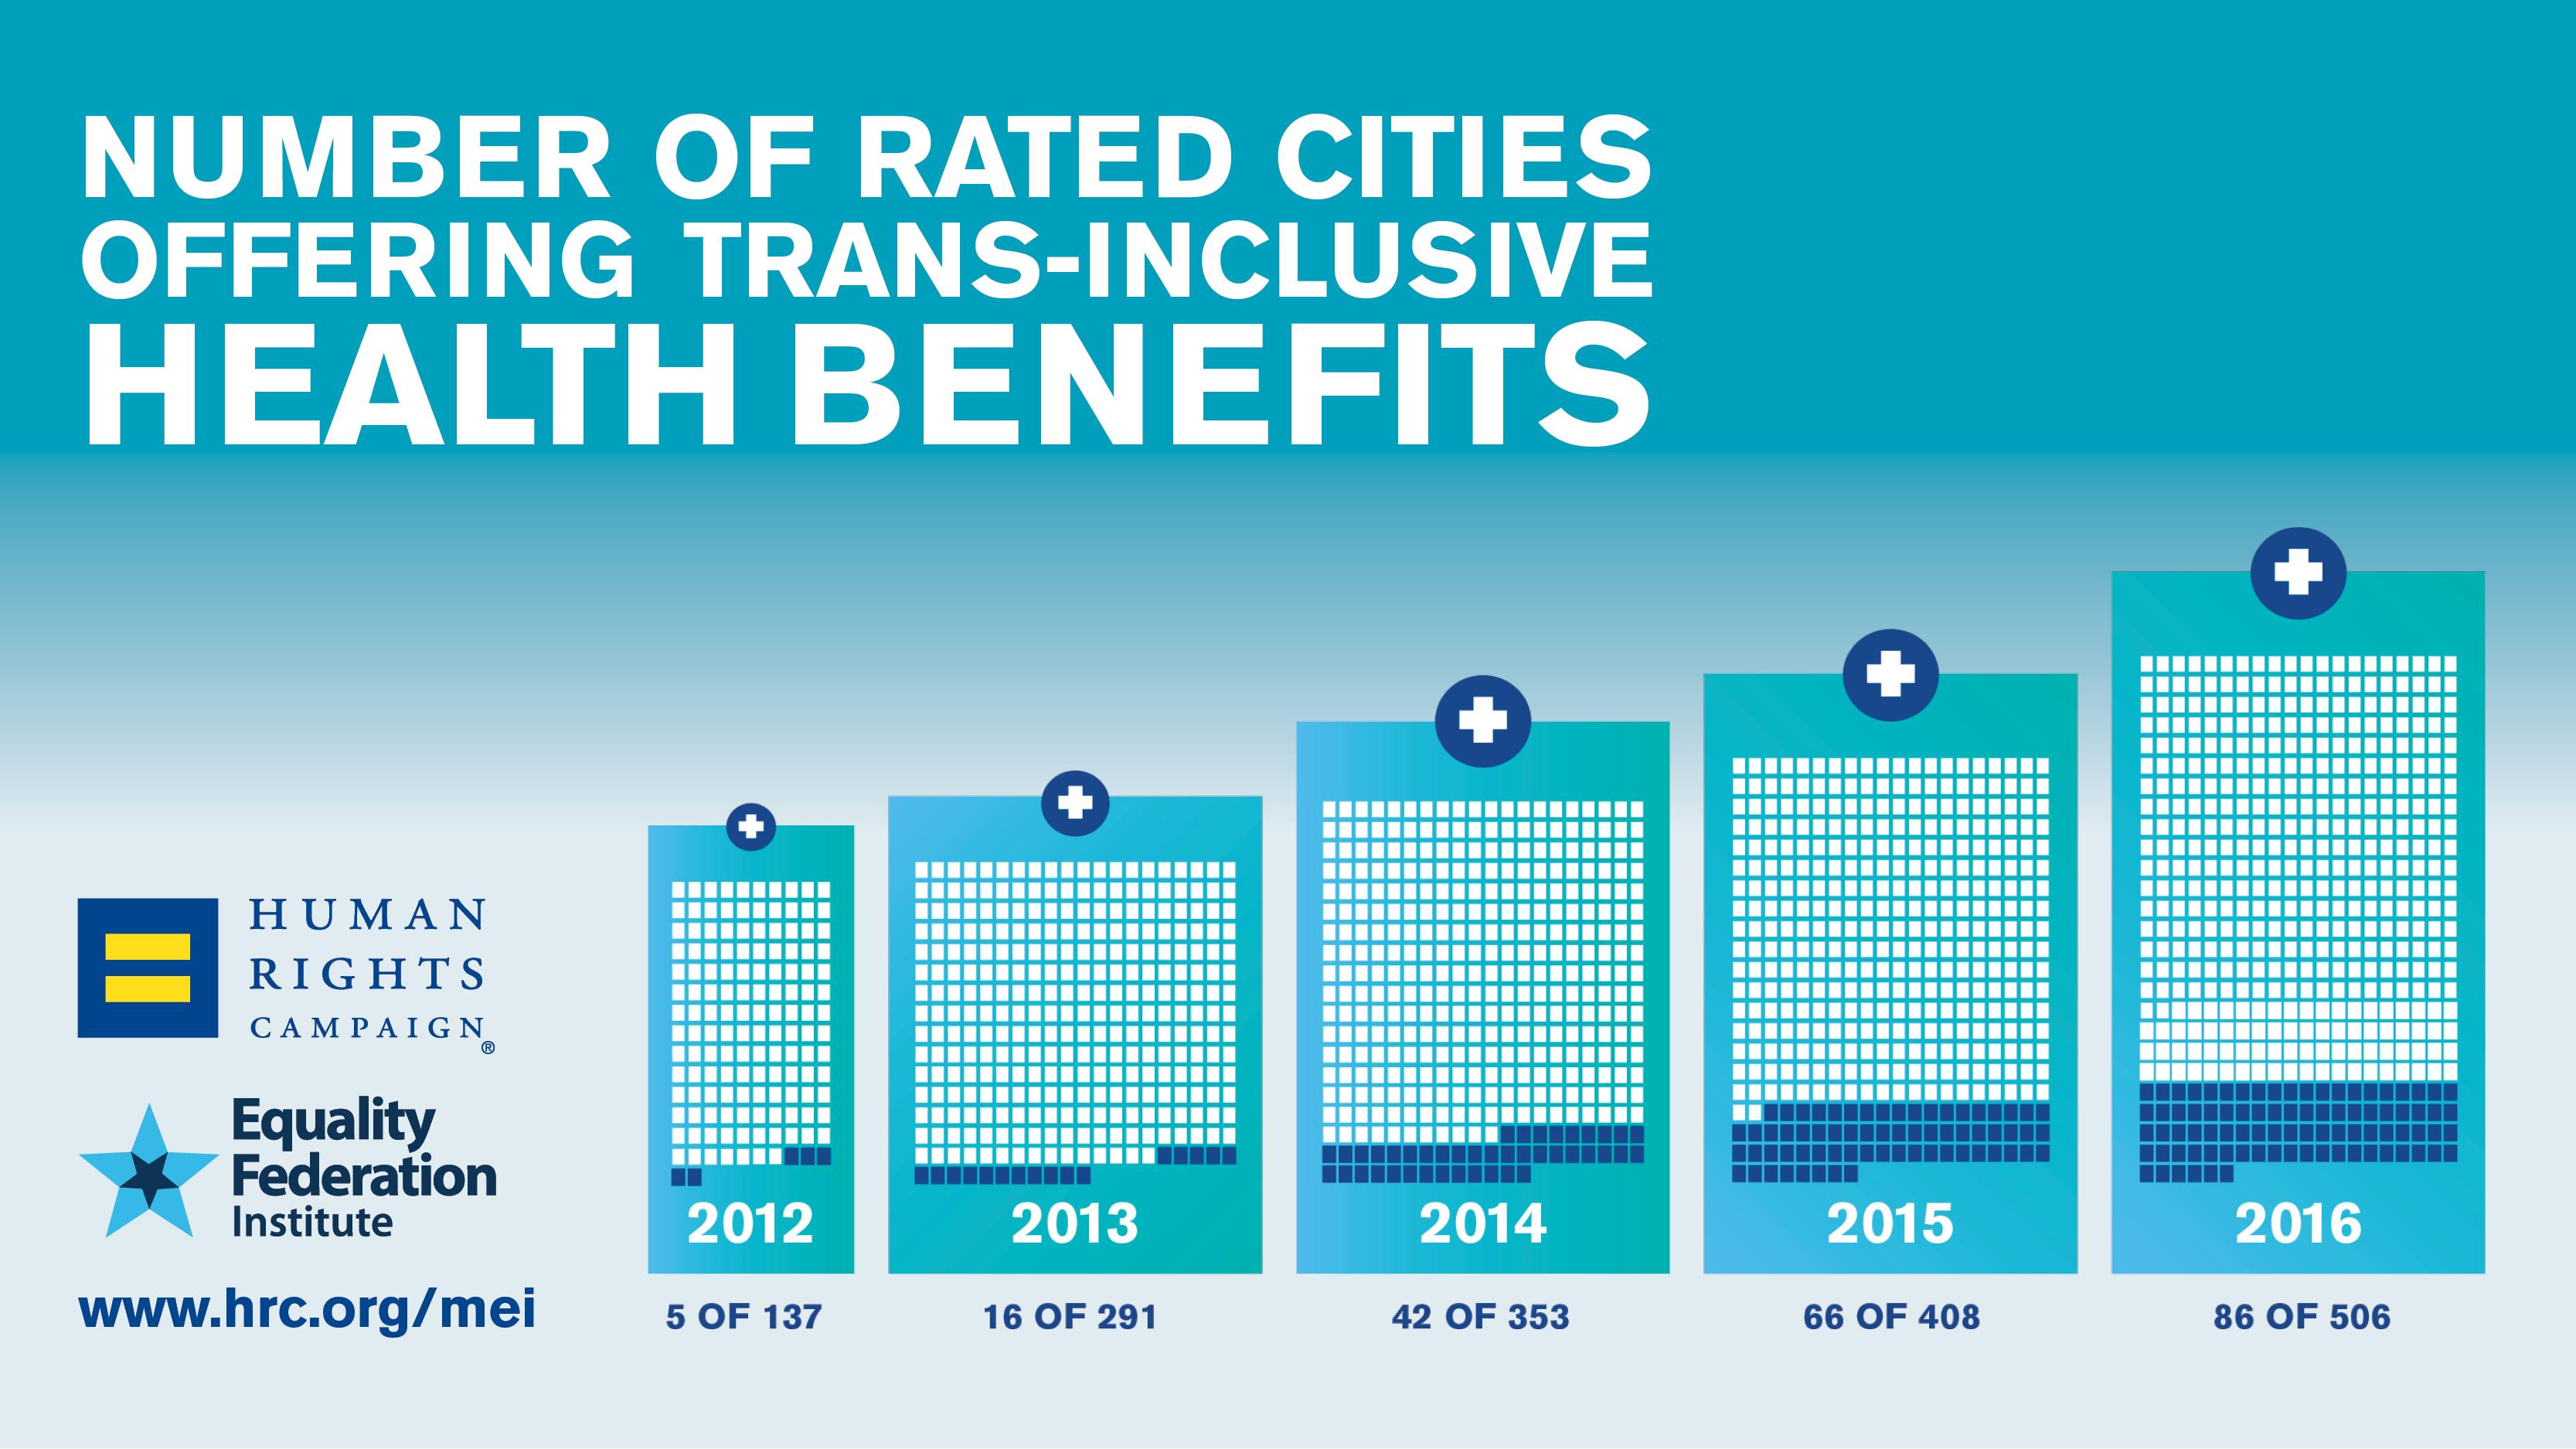 Municipal Equality Index Shows Noteworthy Progress on Transgender Equality